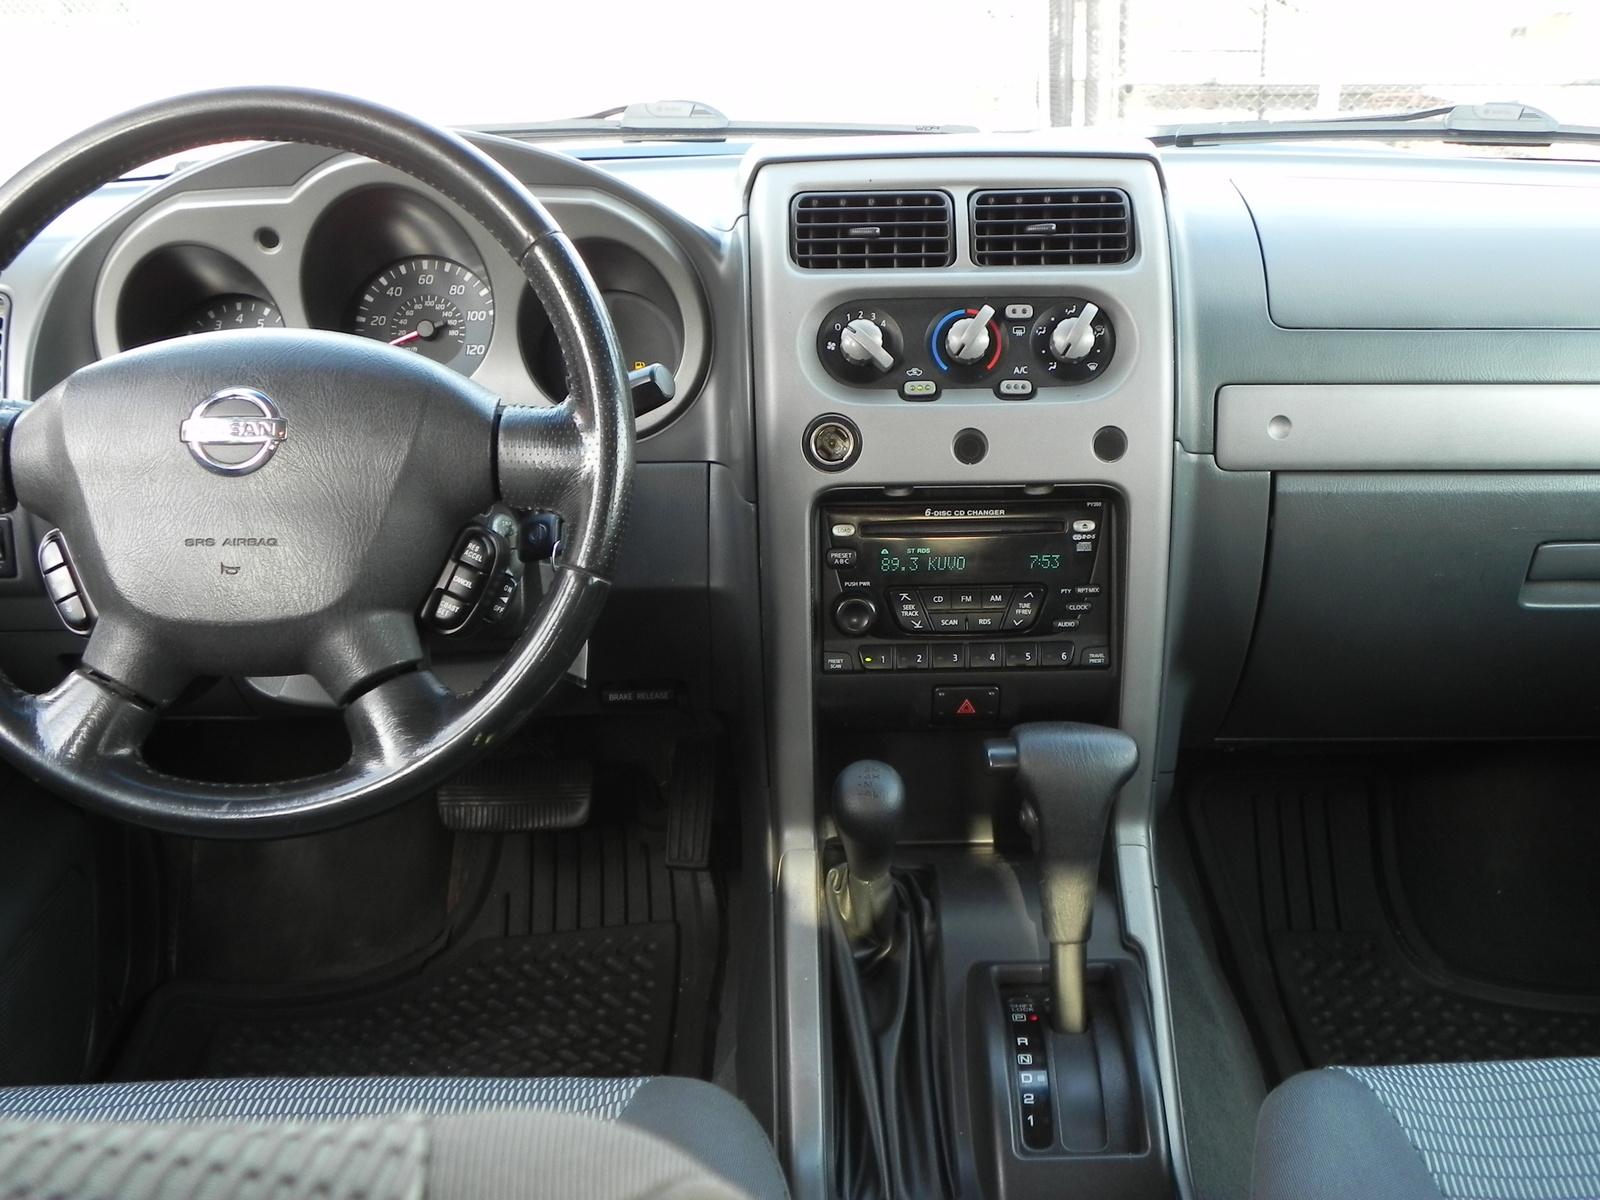 2002 Nissan Xterra Pictures Cargurus